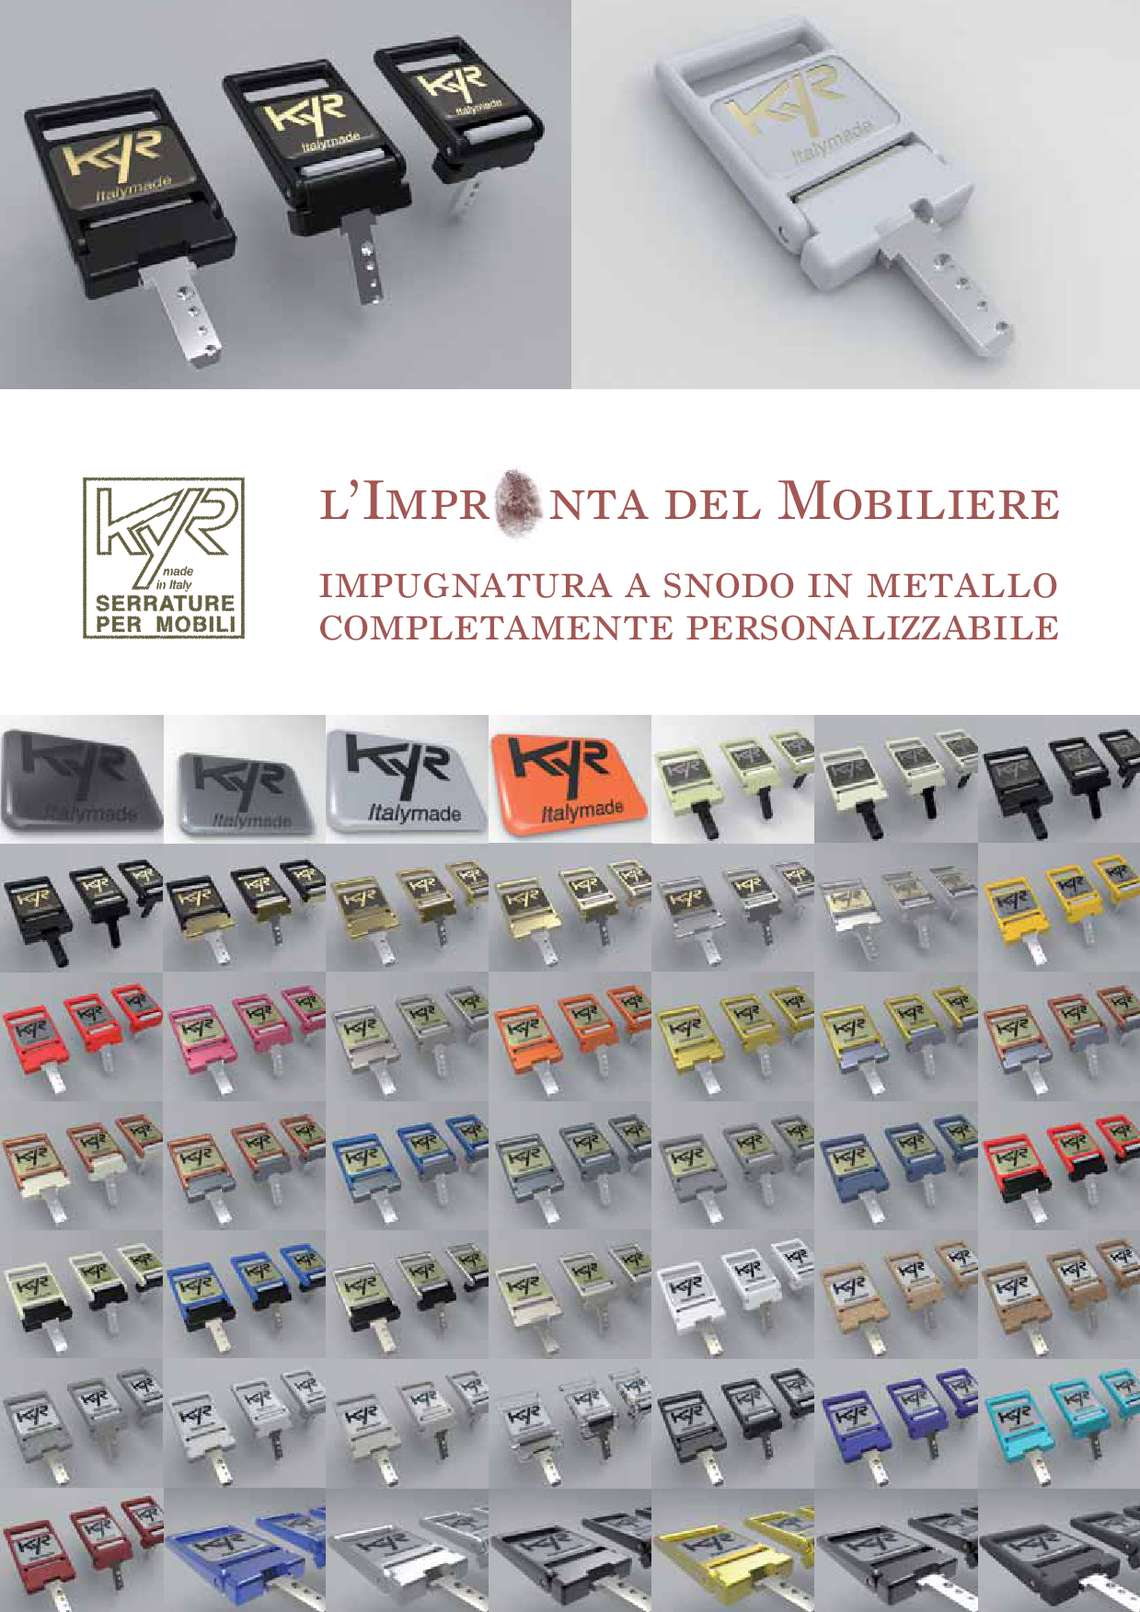 Securital serrature per mobili 86 for Catalogo di mobili